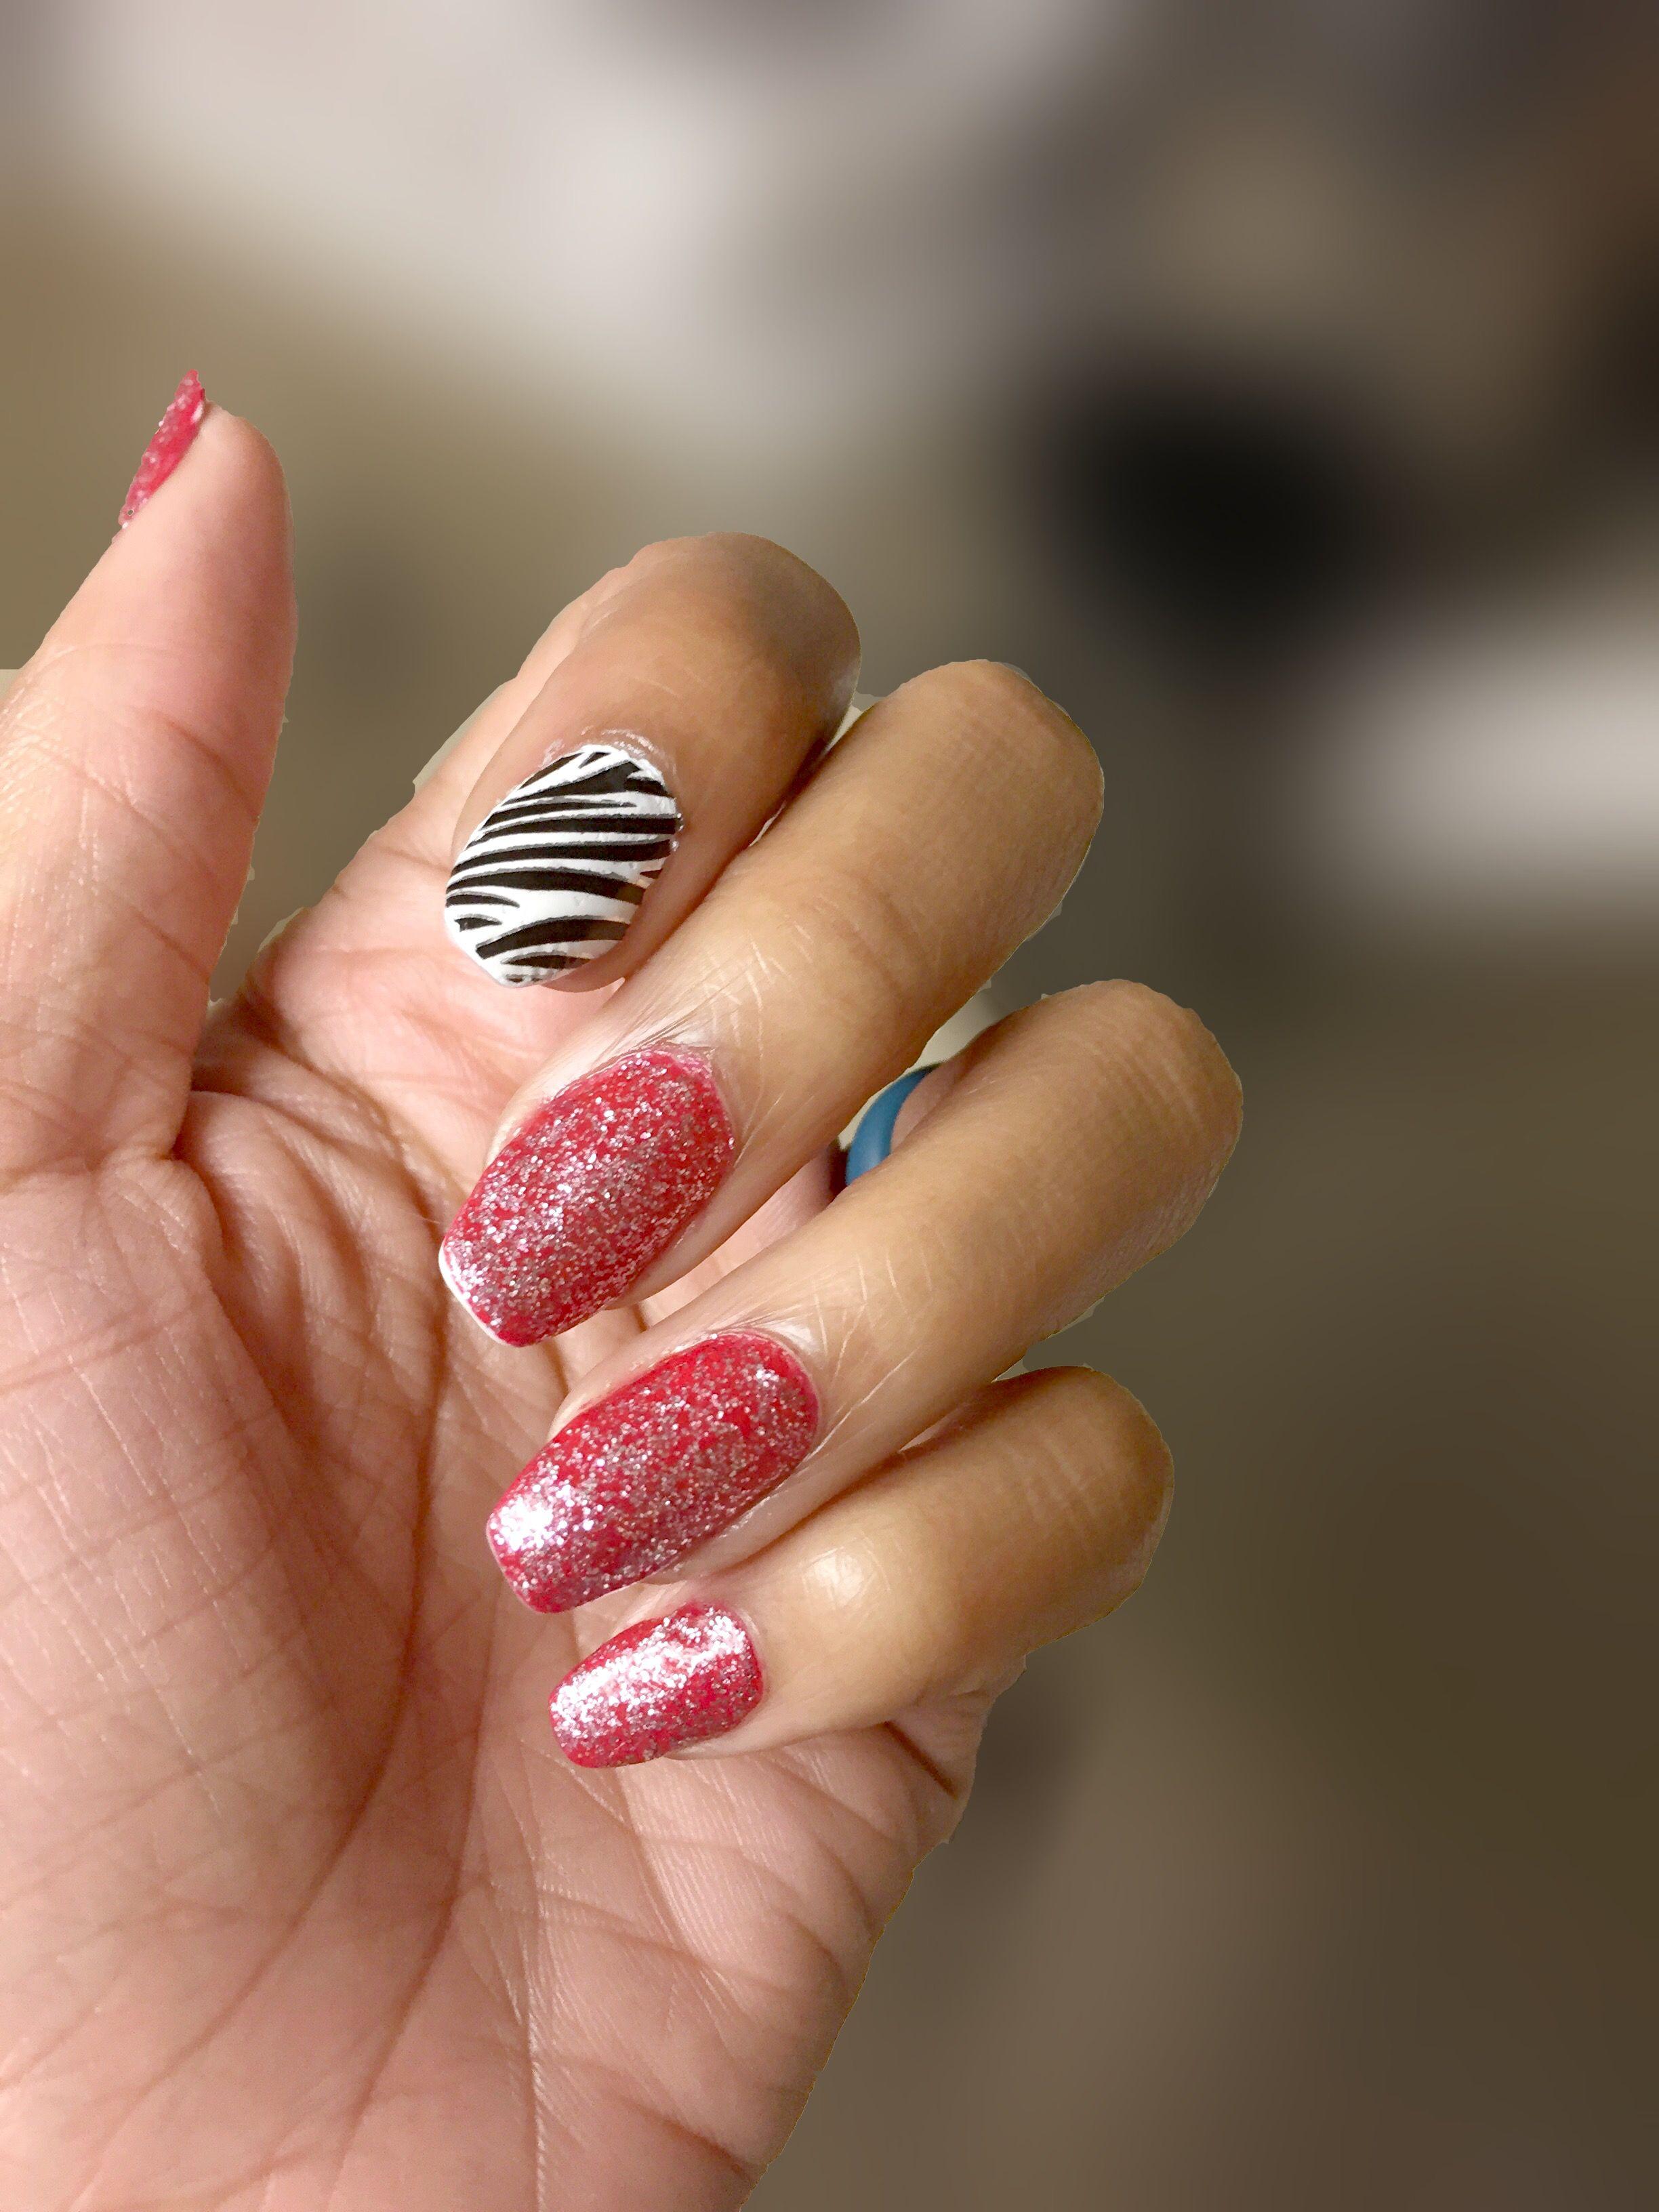 Fake acrylic nails made with cornstarch | My Nail Designs ...